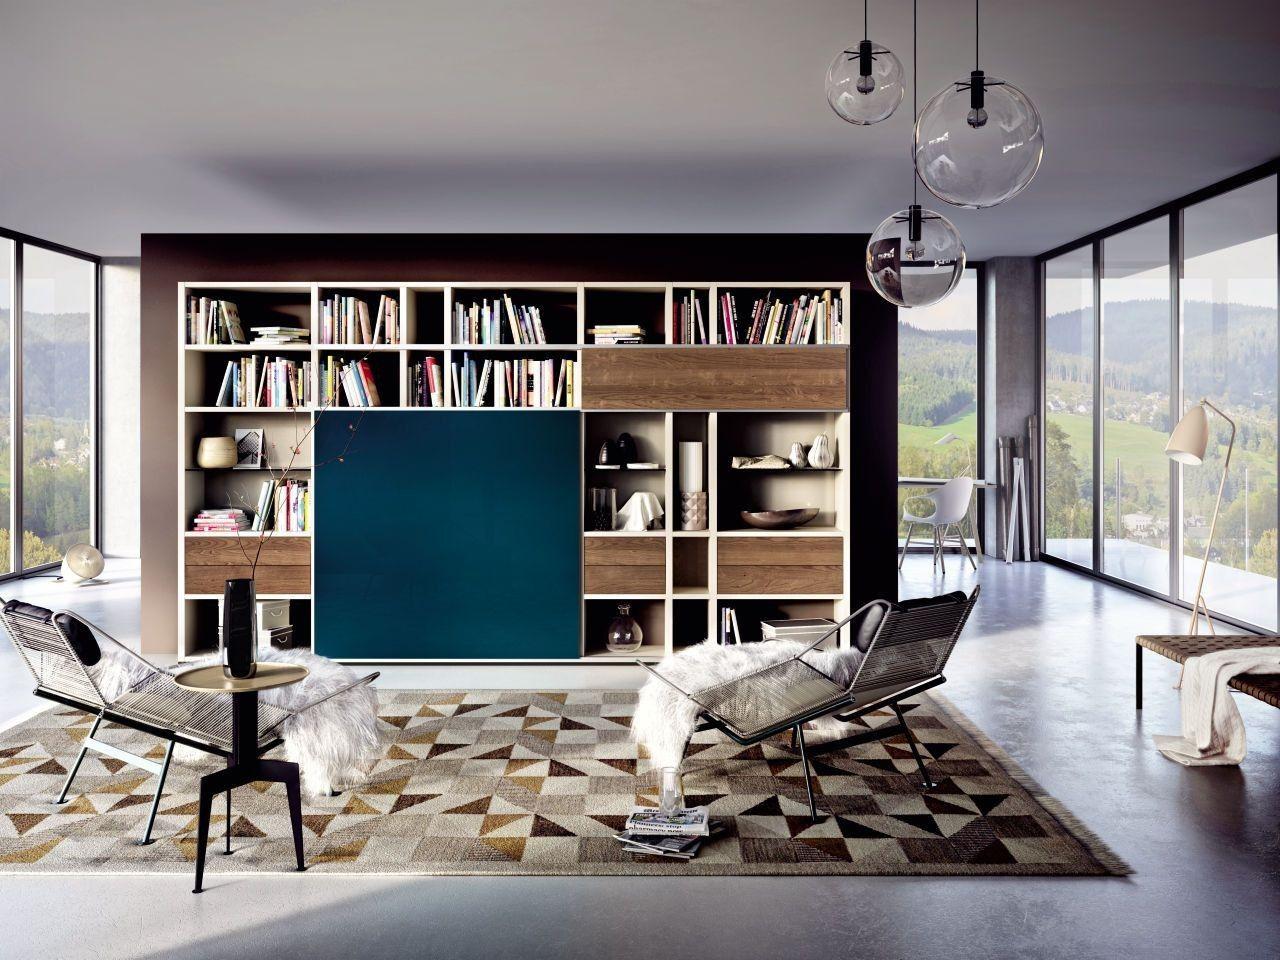 Wohnwand Hulsta Mega Design Mit Bildern Hulsta Mega Design Wohnzimmermobel Modern Wohnen